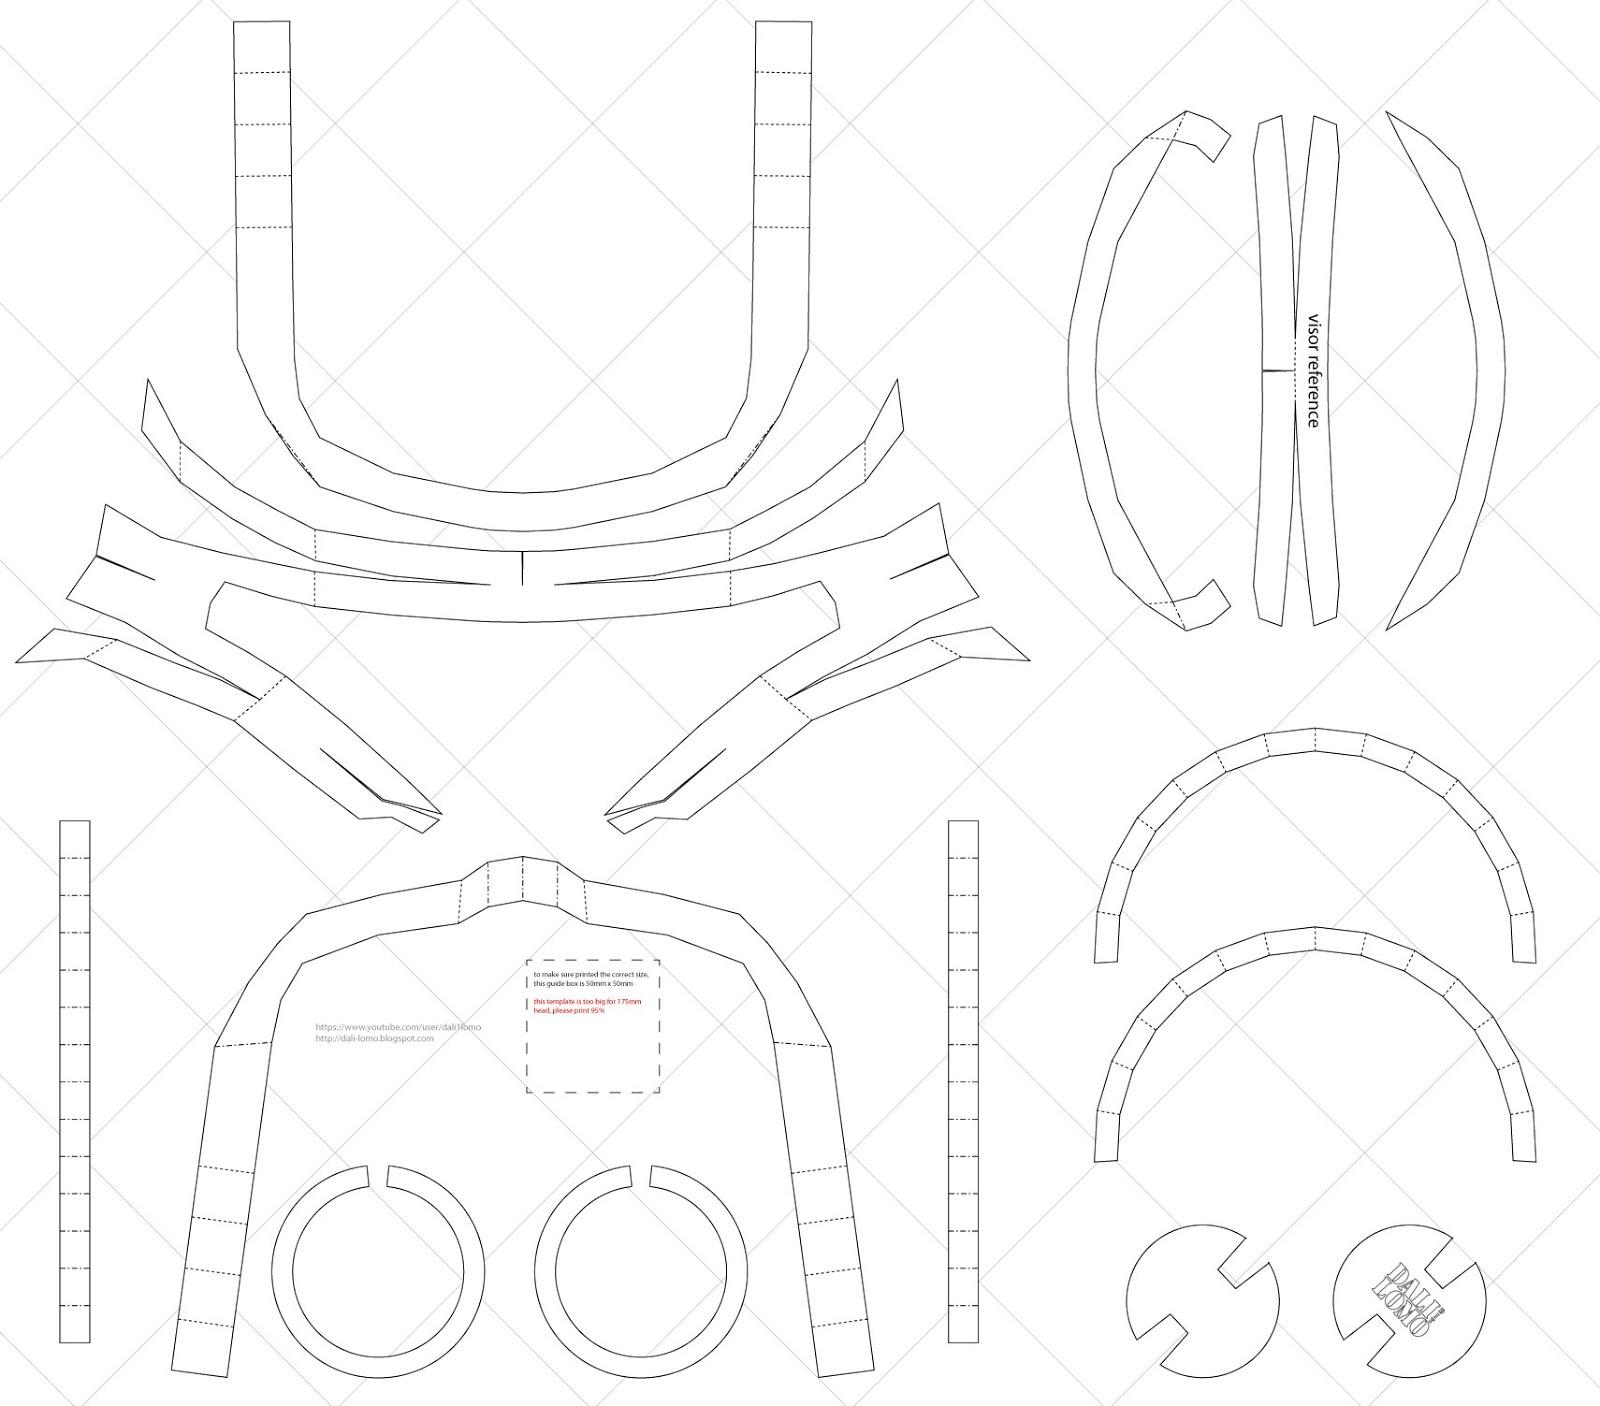 Cyclops visor clipart clipart transparent download Dali-Lomo: How to Make X-MEN Cyclops Visor DIY (free PDF ... clipart transparent download